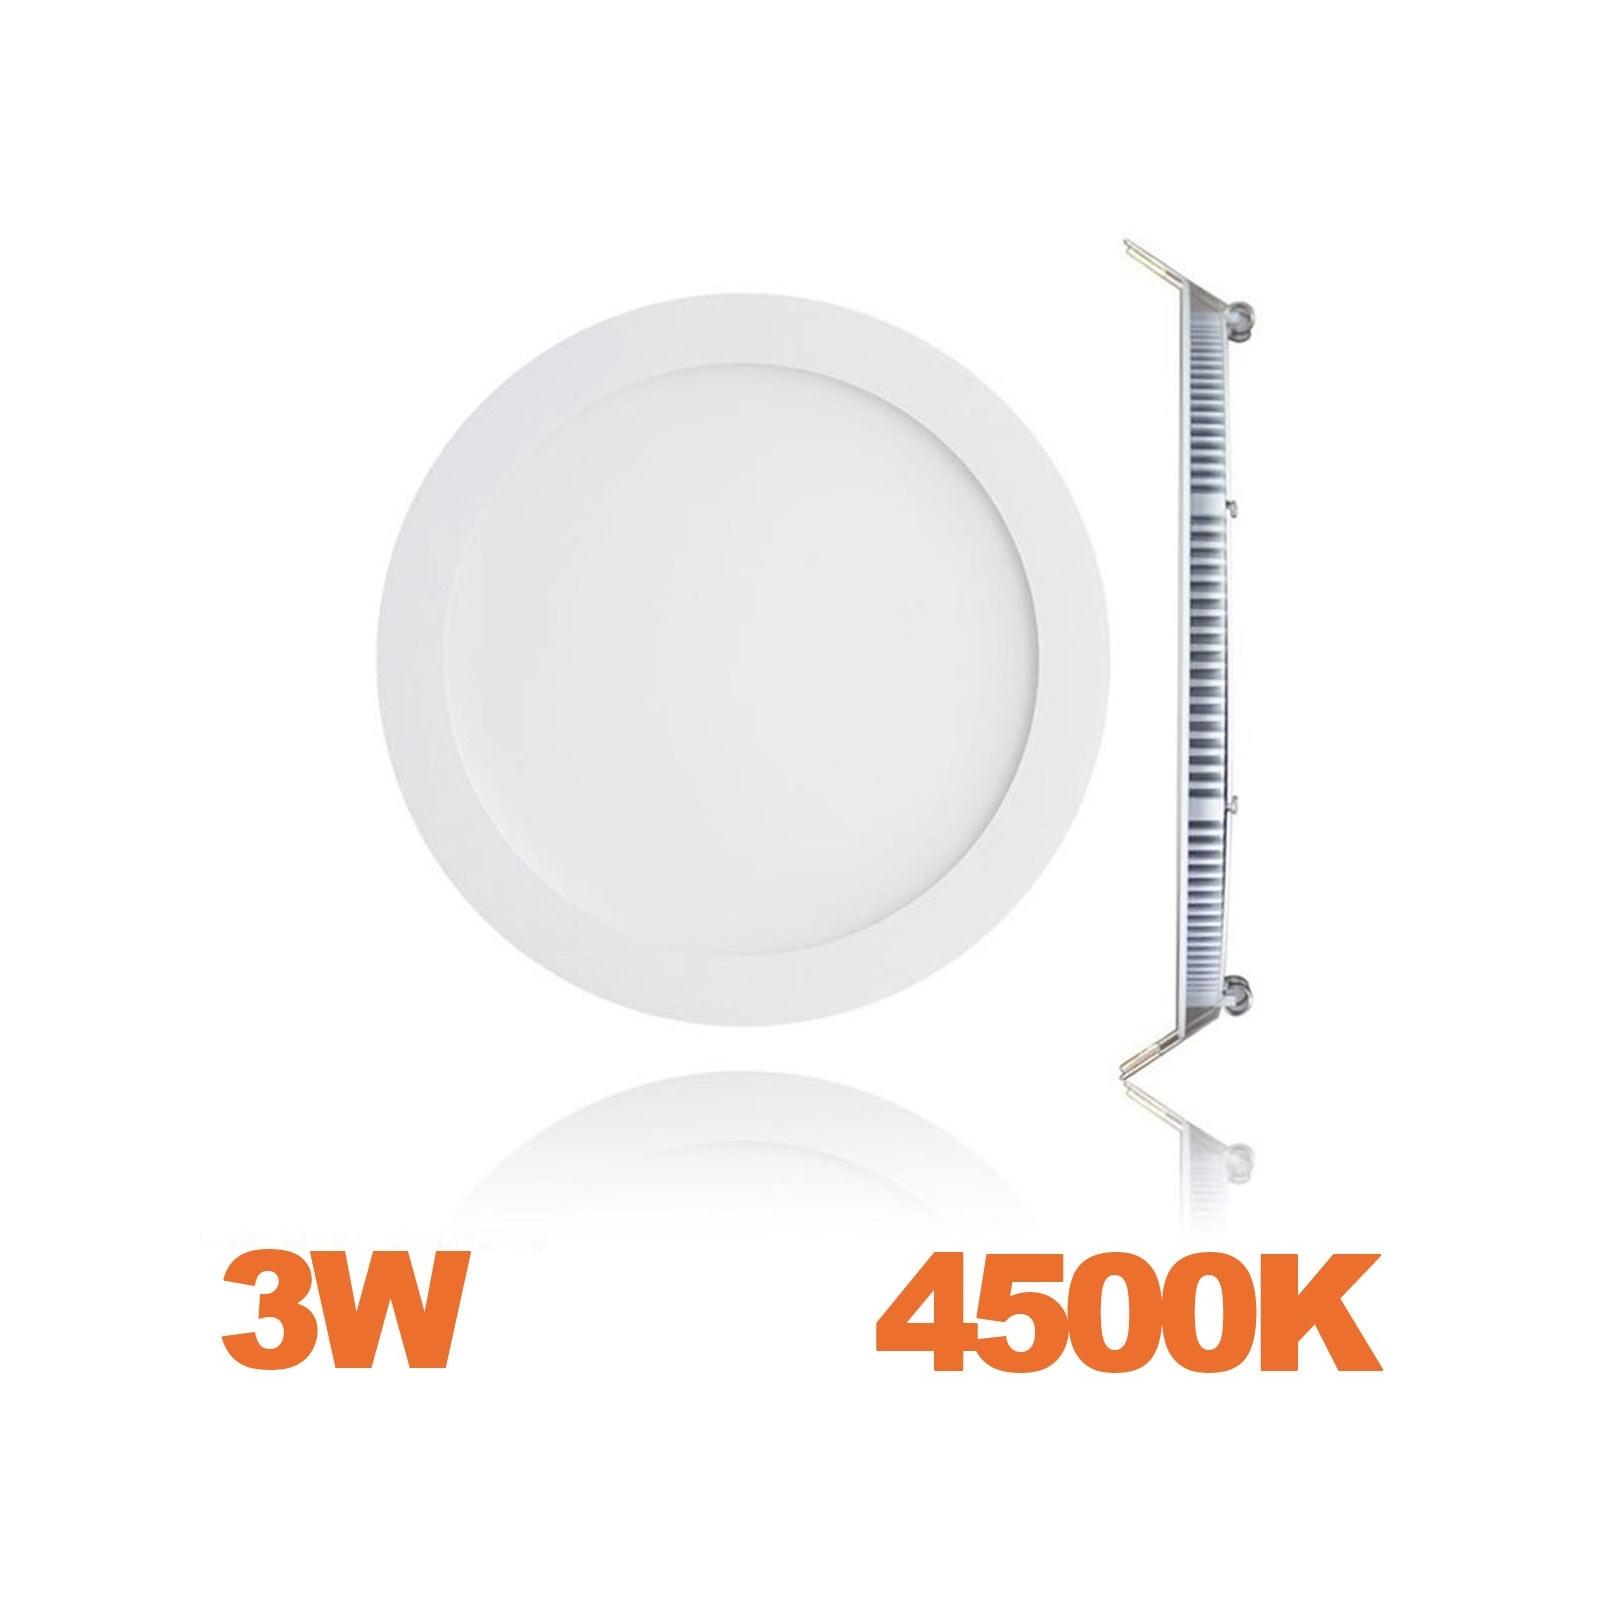 Spot Encastrable LED Downlight Panel Extra-Plat 3W Blanc Neutre 4500K